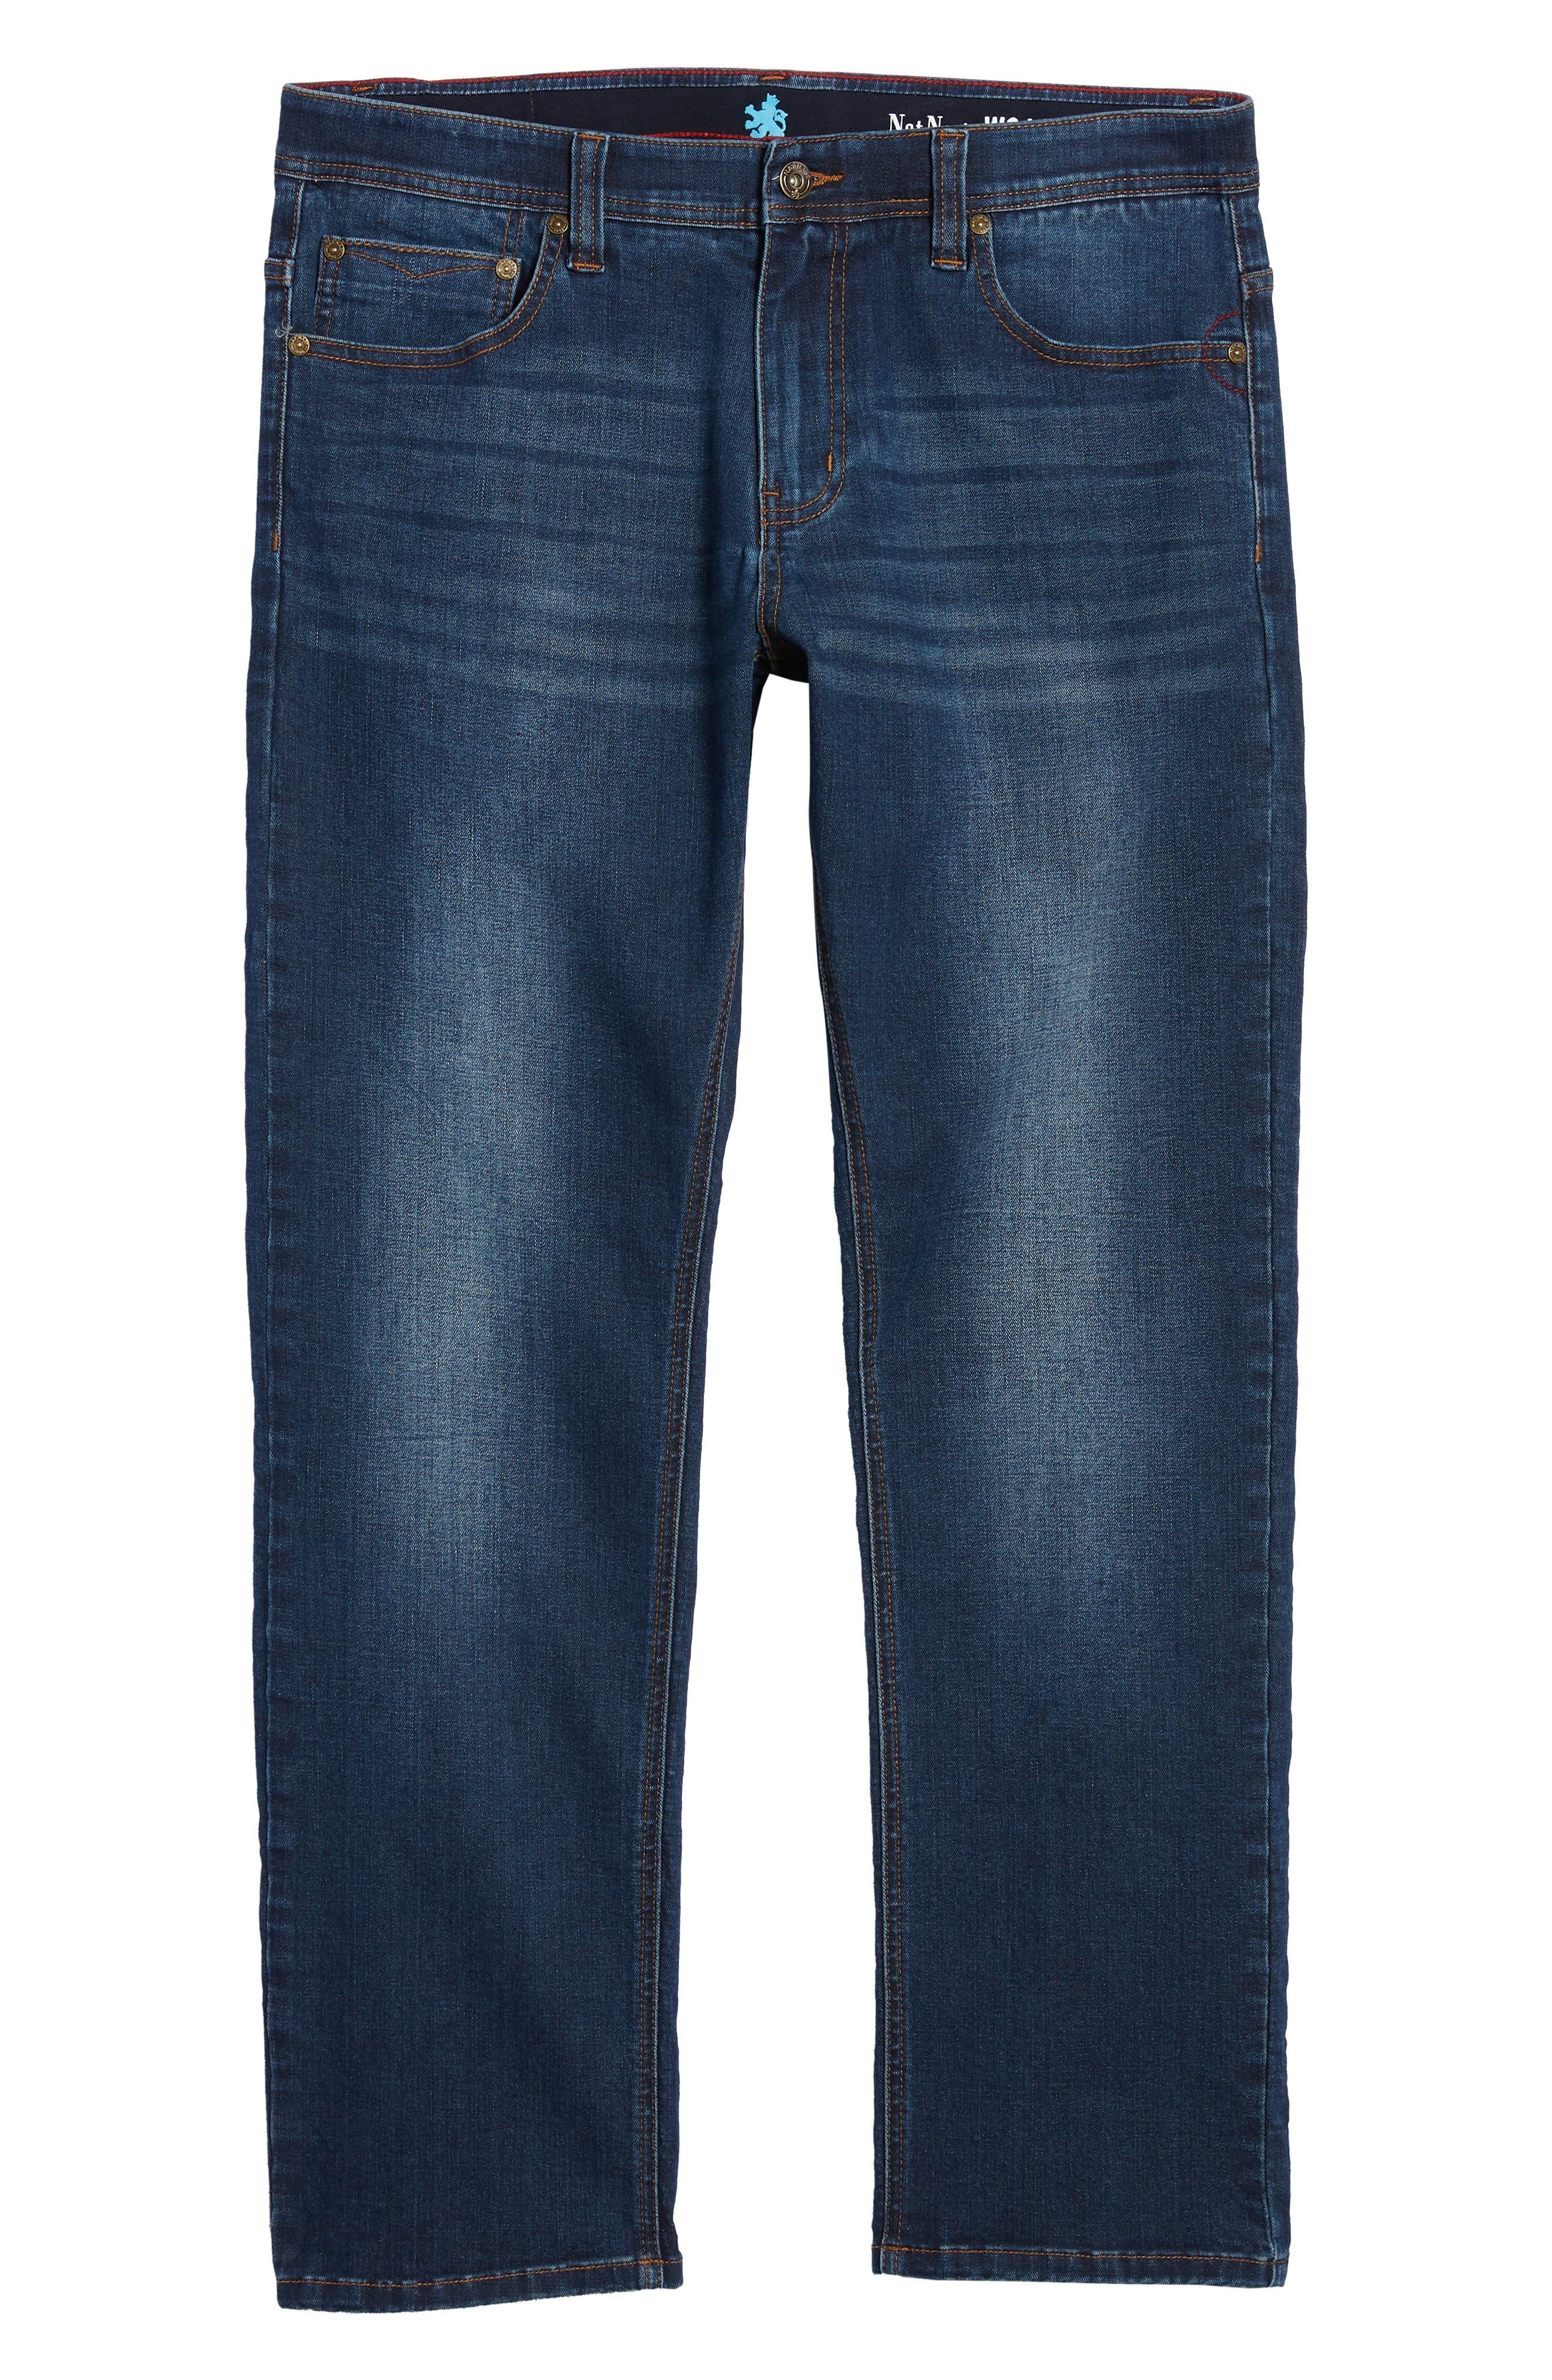 Maverick Stretch Slim Fit Jeans,                             Alternate thumbnail 6, color,                             400